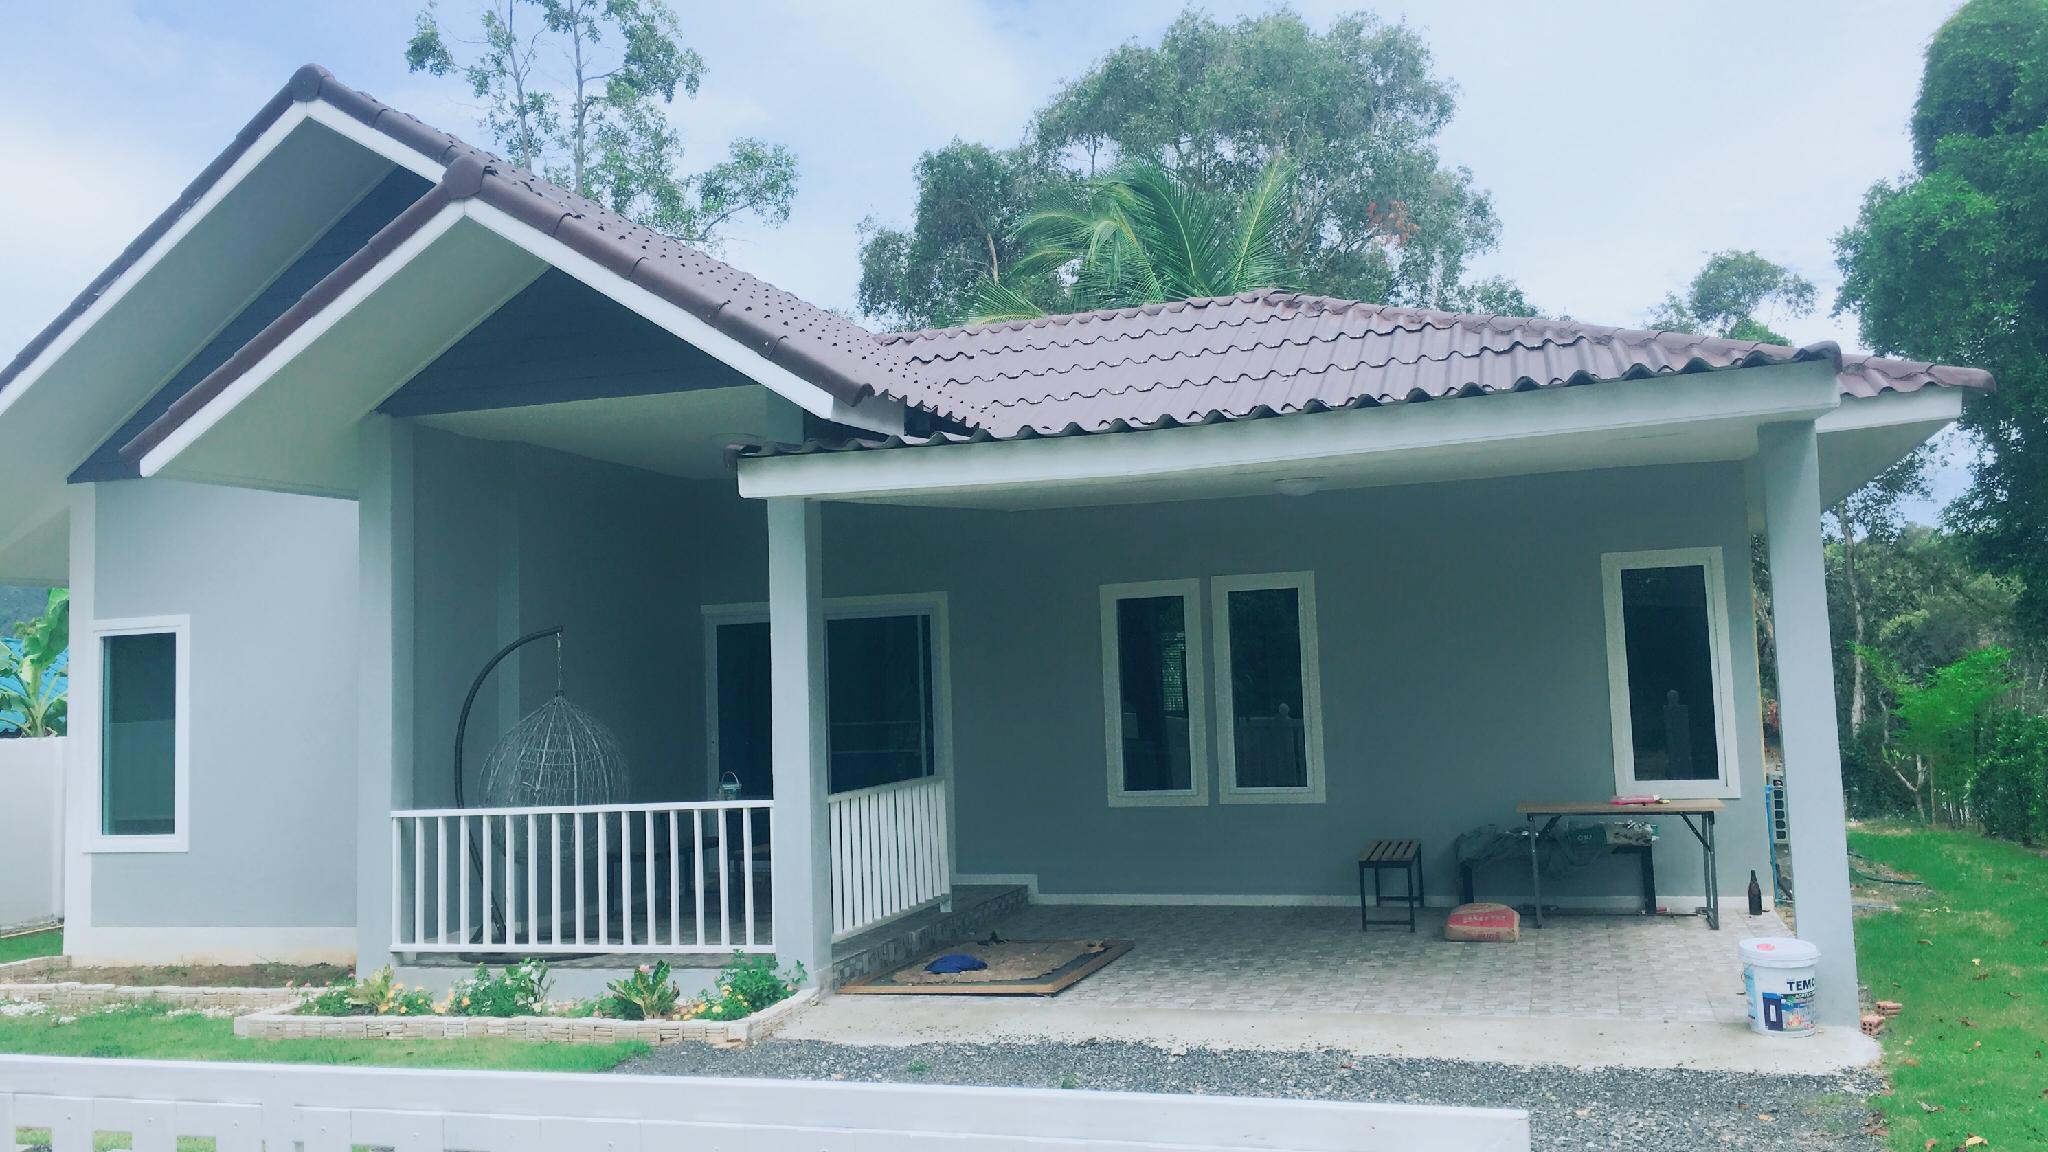 Song khaw villa วิลลา 3 ห้องนอน 2 ห้องน้ำส่วนตัว ขนาด 107 ตร.ม. – หน้าทอน